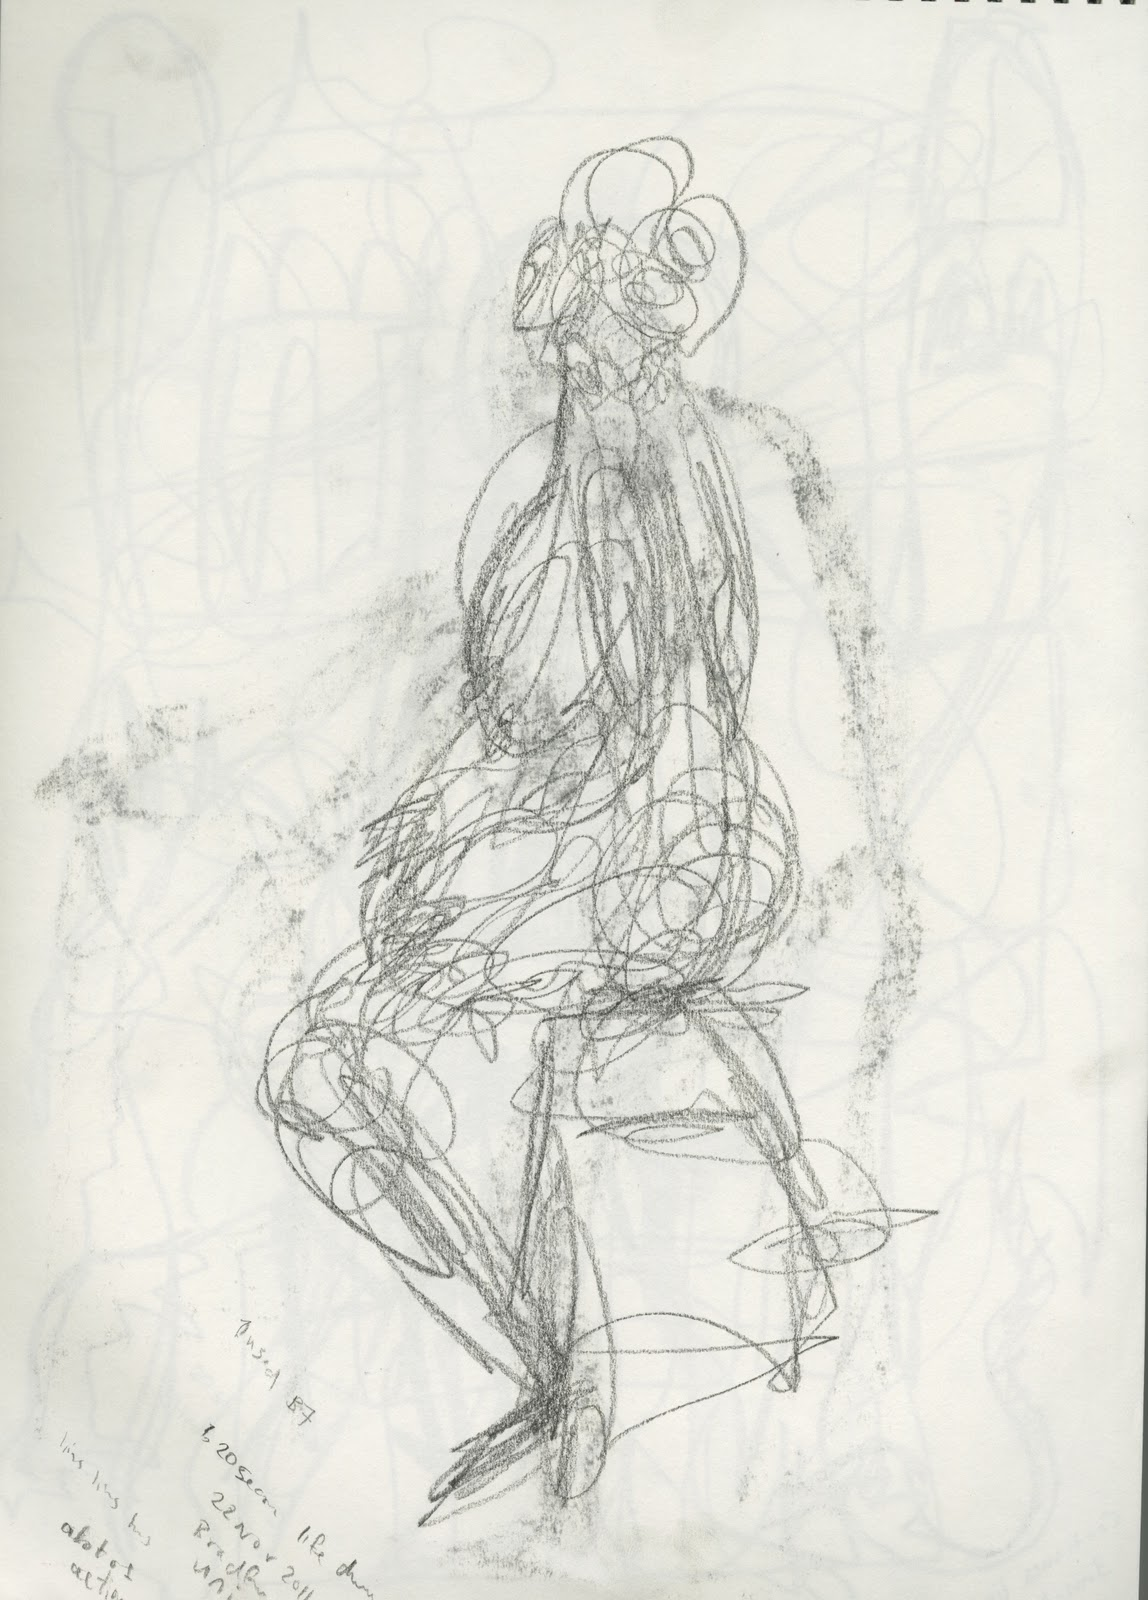 SarokZana O D: Week: 9 Life Drawing and Basic Human Anatomy